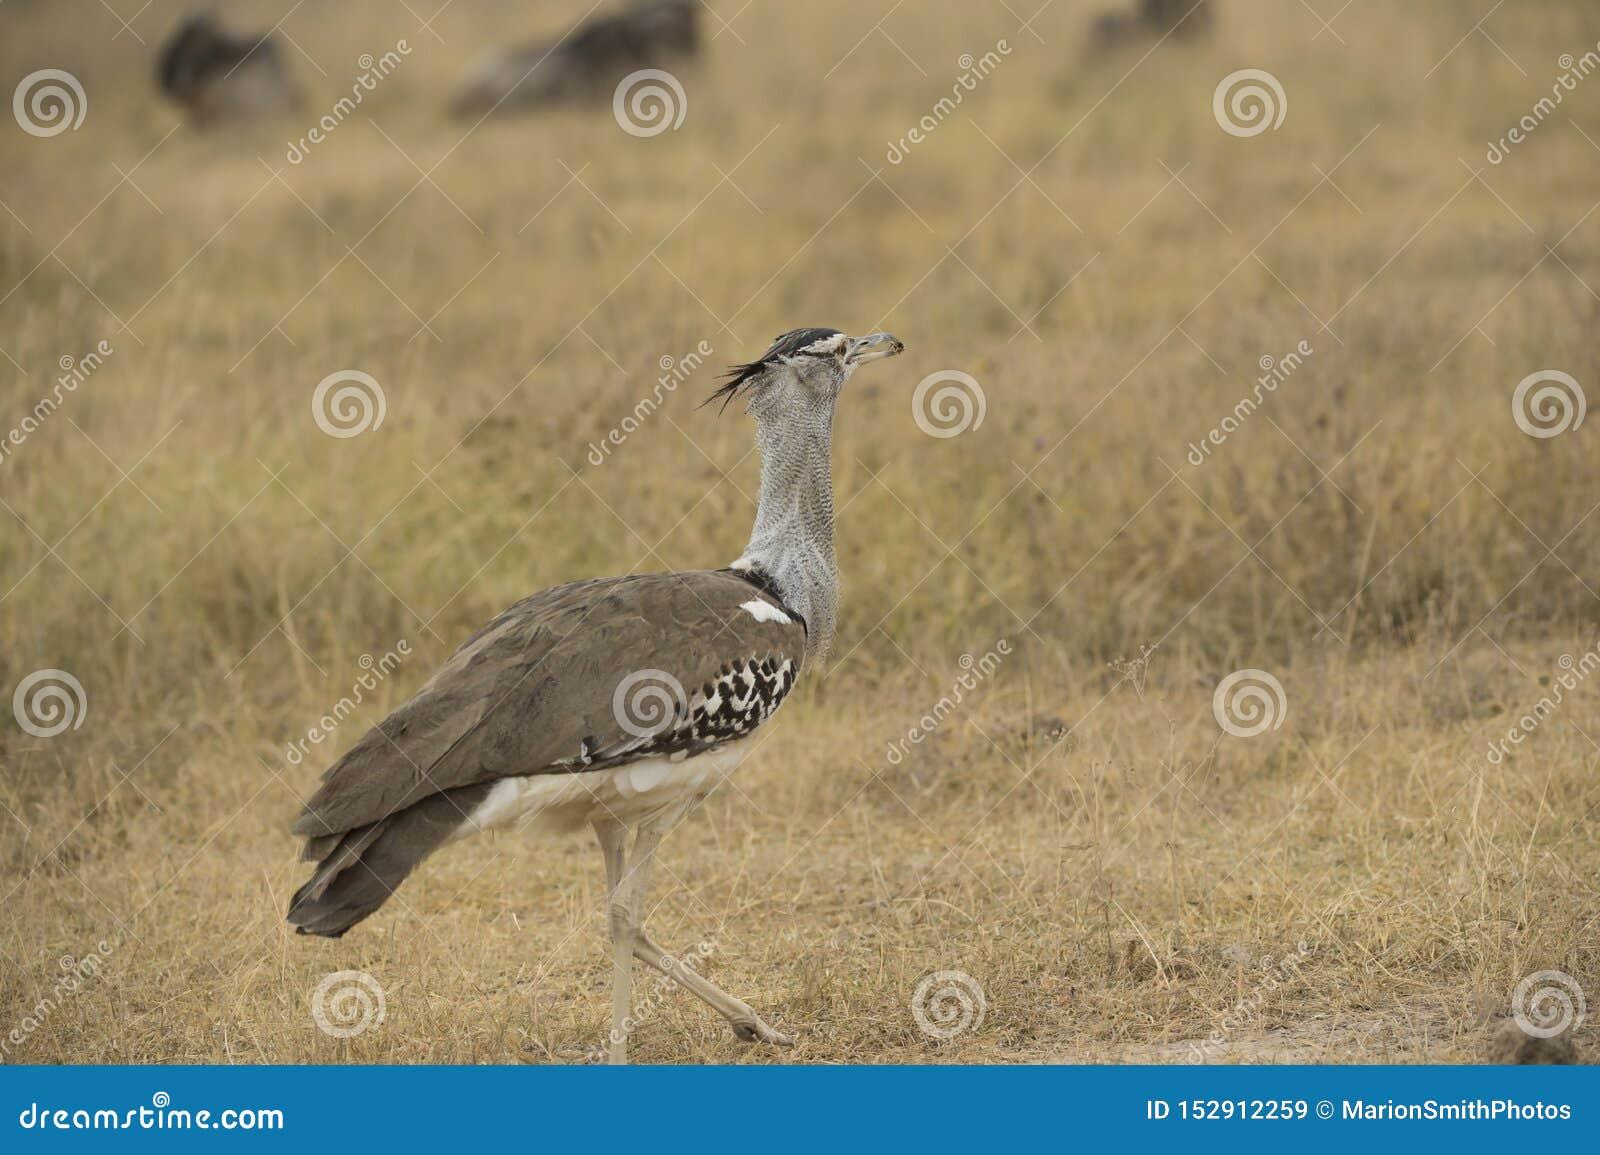 Masaistruisvogel, als de roze-necked struisvogel ook wordt bekend die